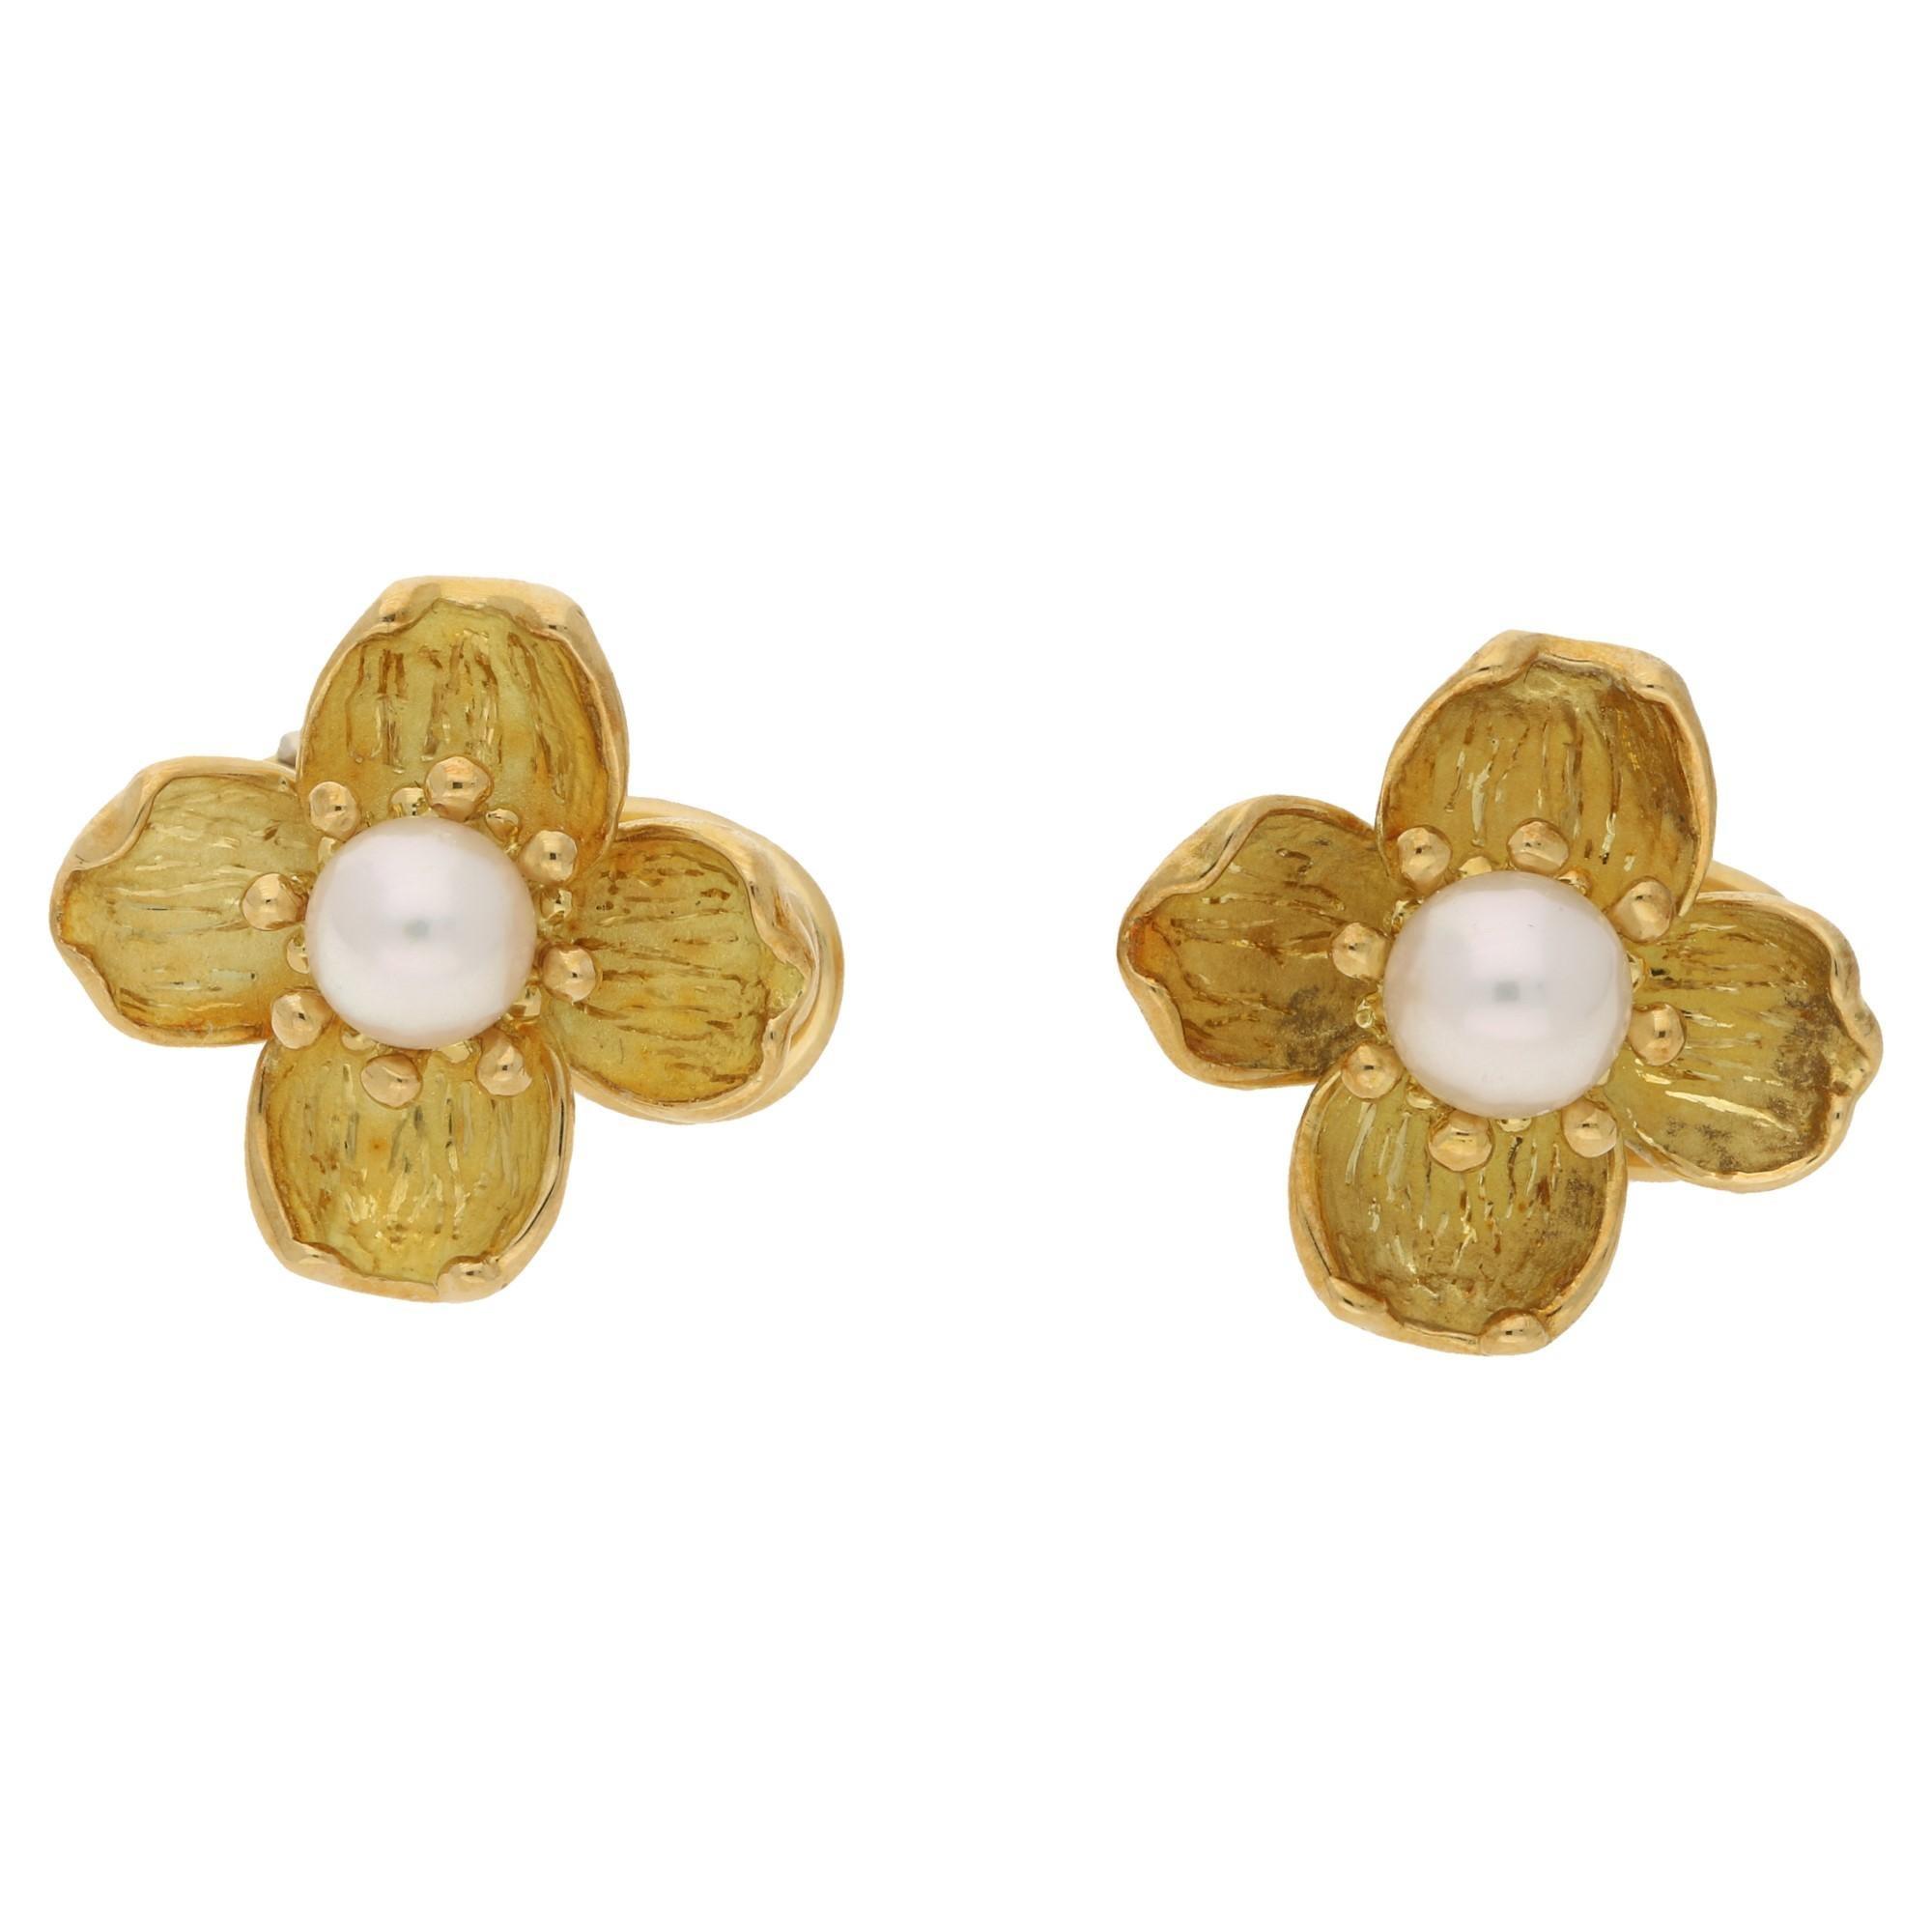 51302fff3374 18 Karat Gold Pearl Tiffany and Co. Dogwood Earrings at 1stdibs